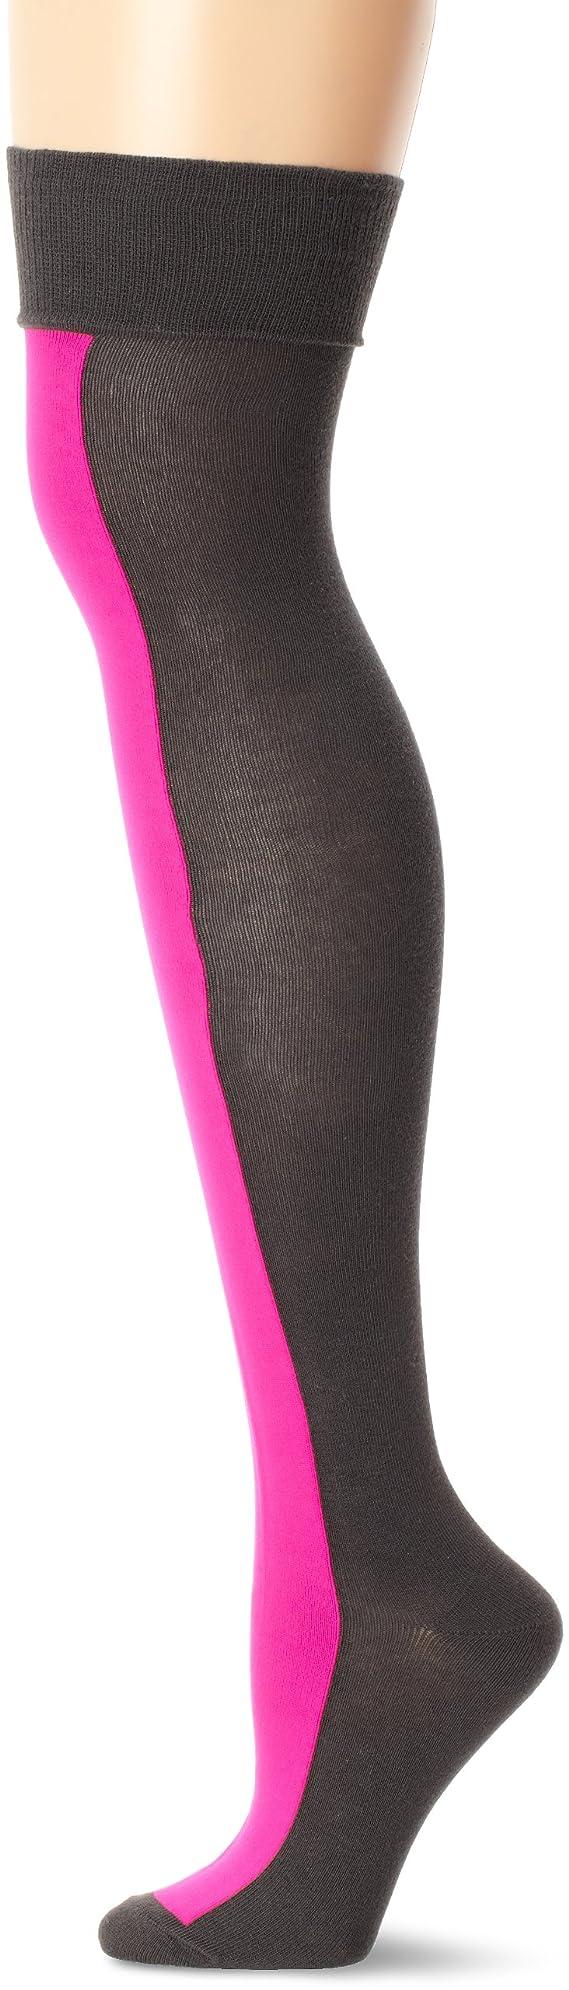 Ozone Women's Neon Racer Socks